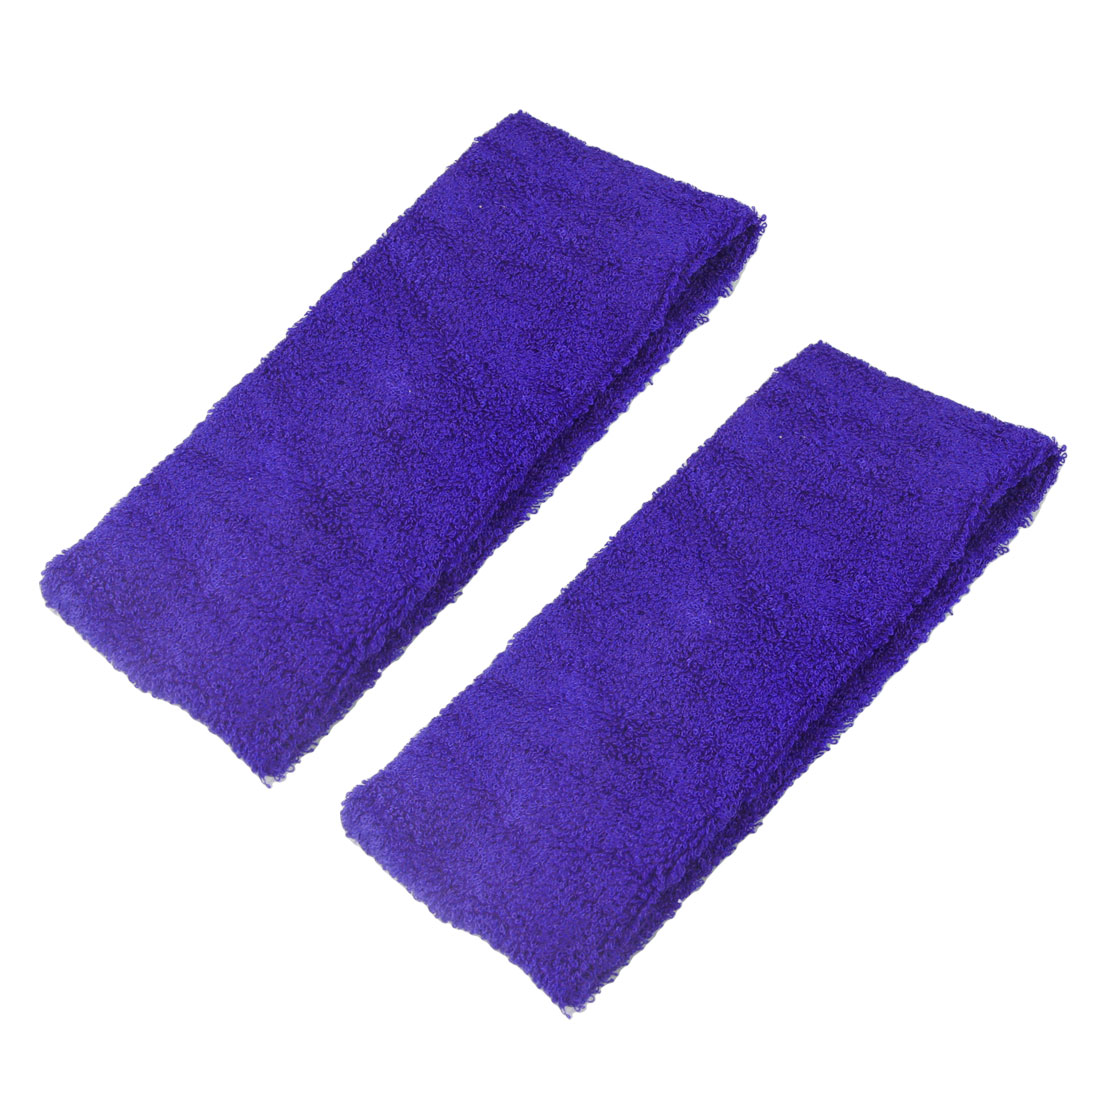 "2 Pieces Terry Cloth 2.6"" Width Elastic Sport Headband Dark Blue"